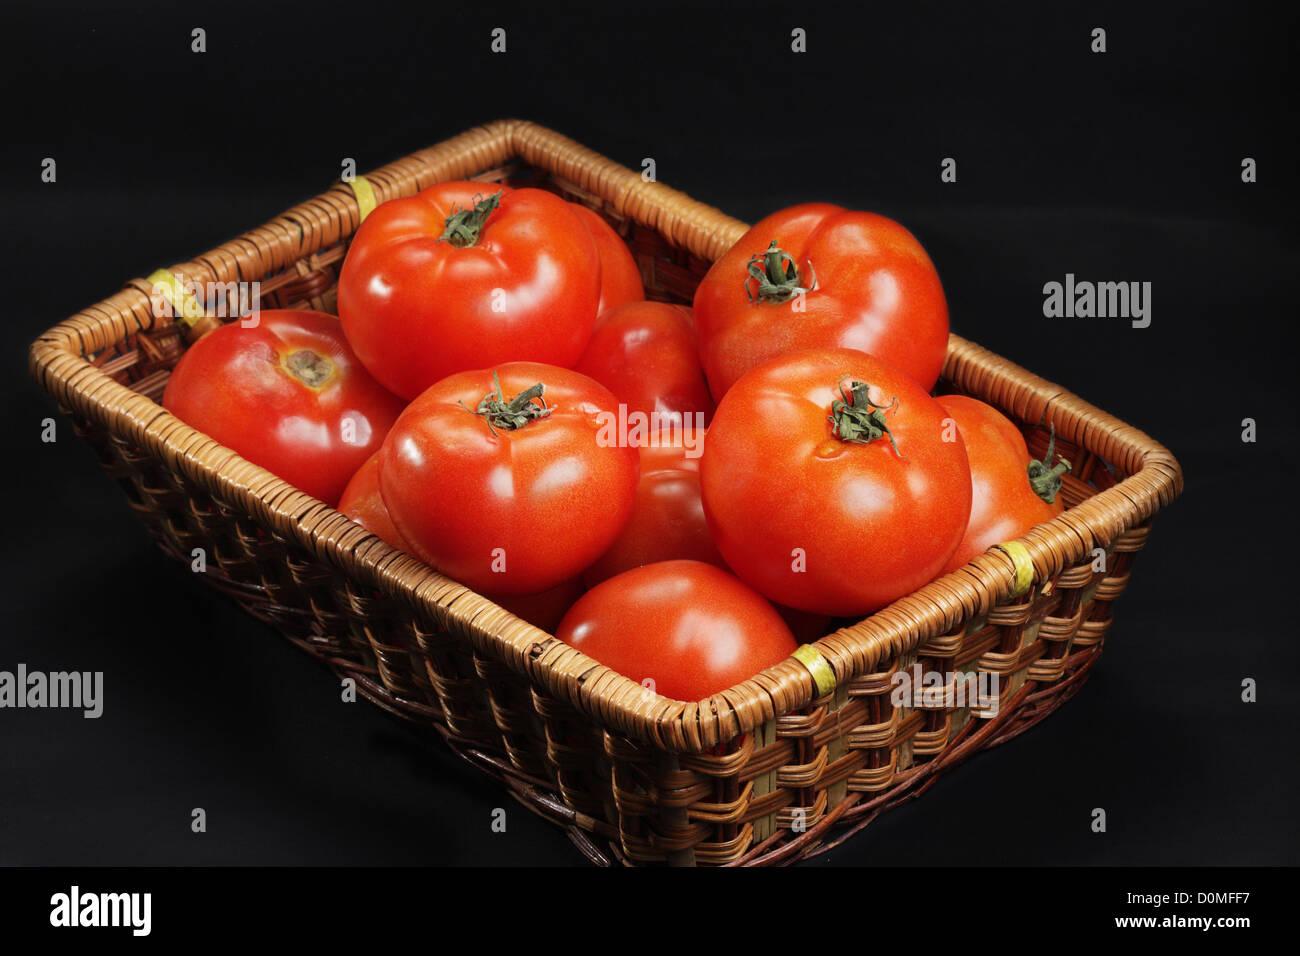 Panier avec tomates intactes seulement Photo Stock